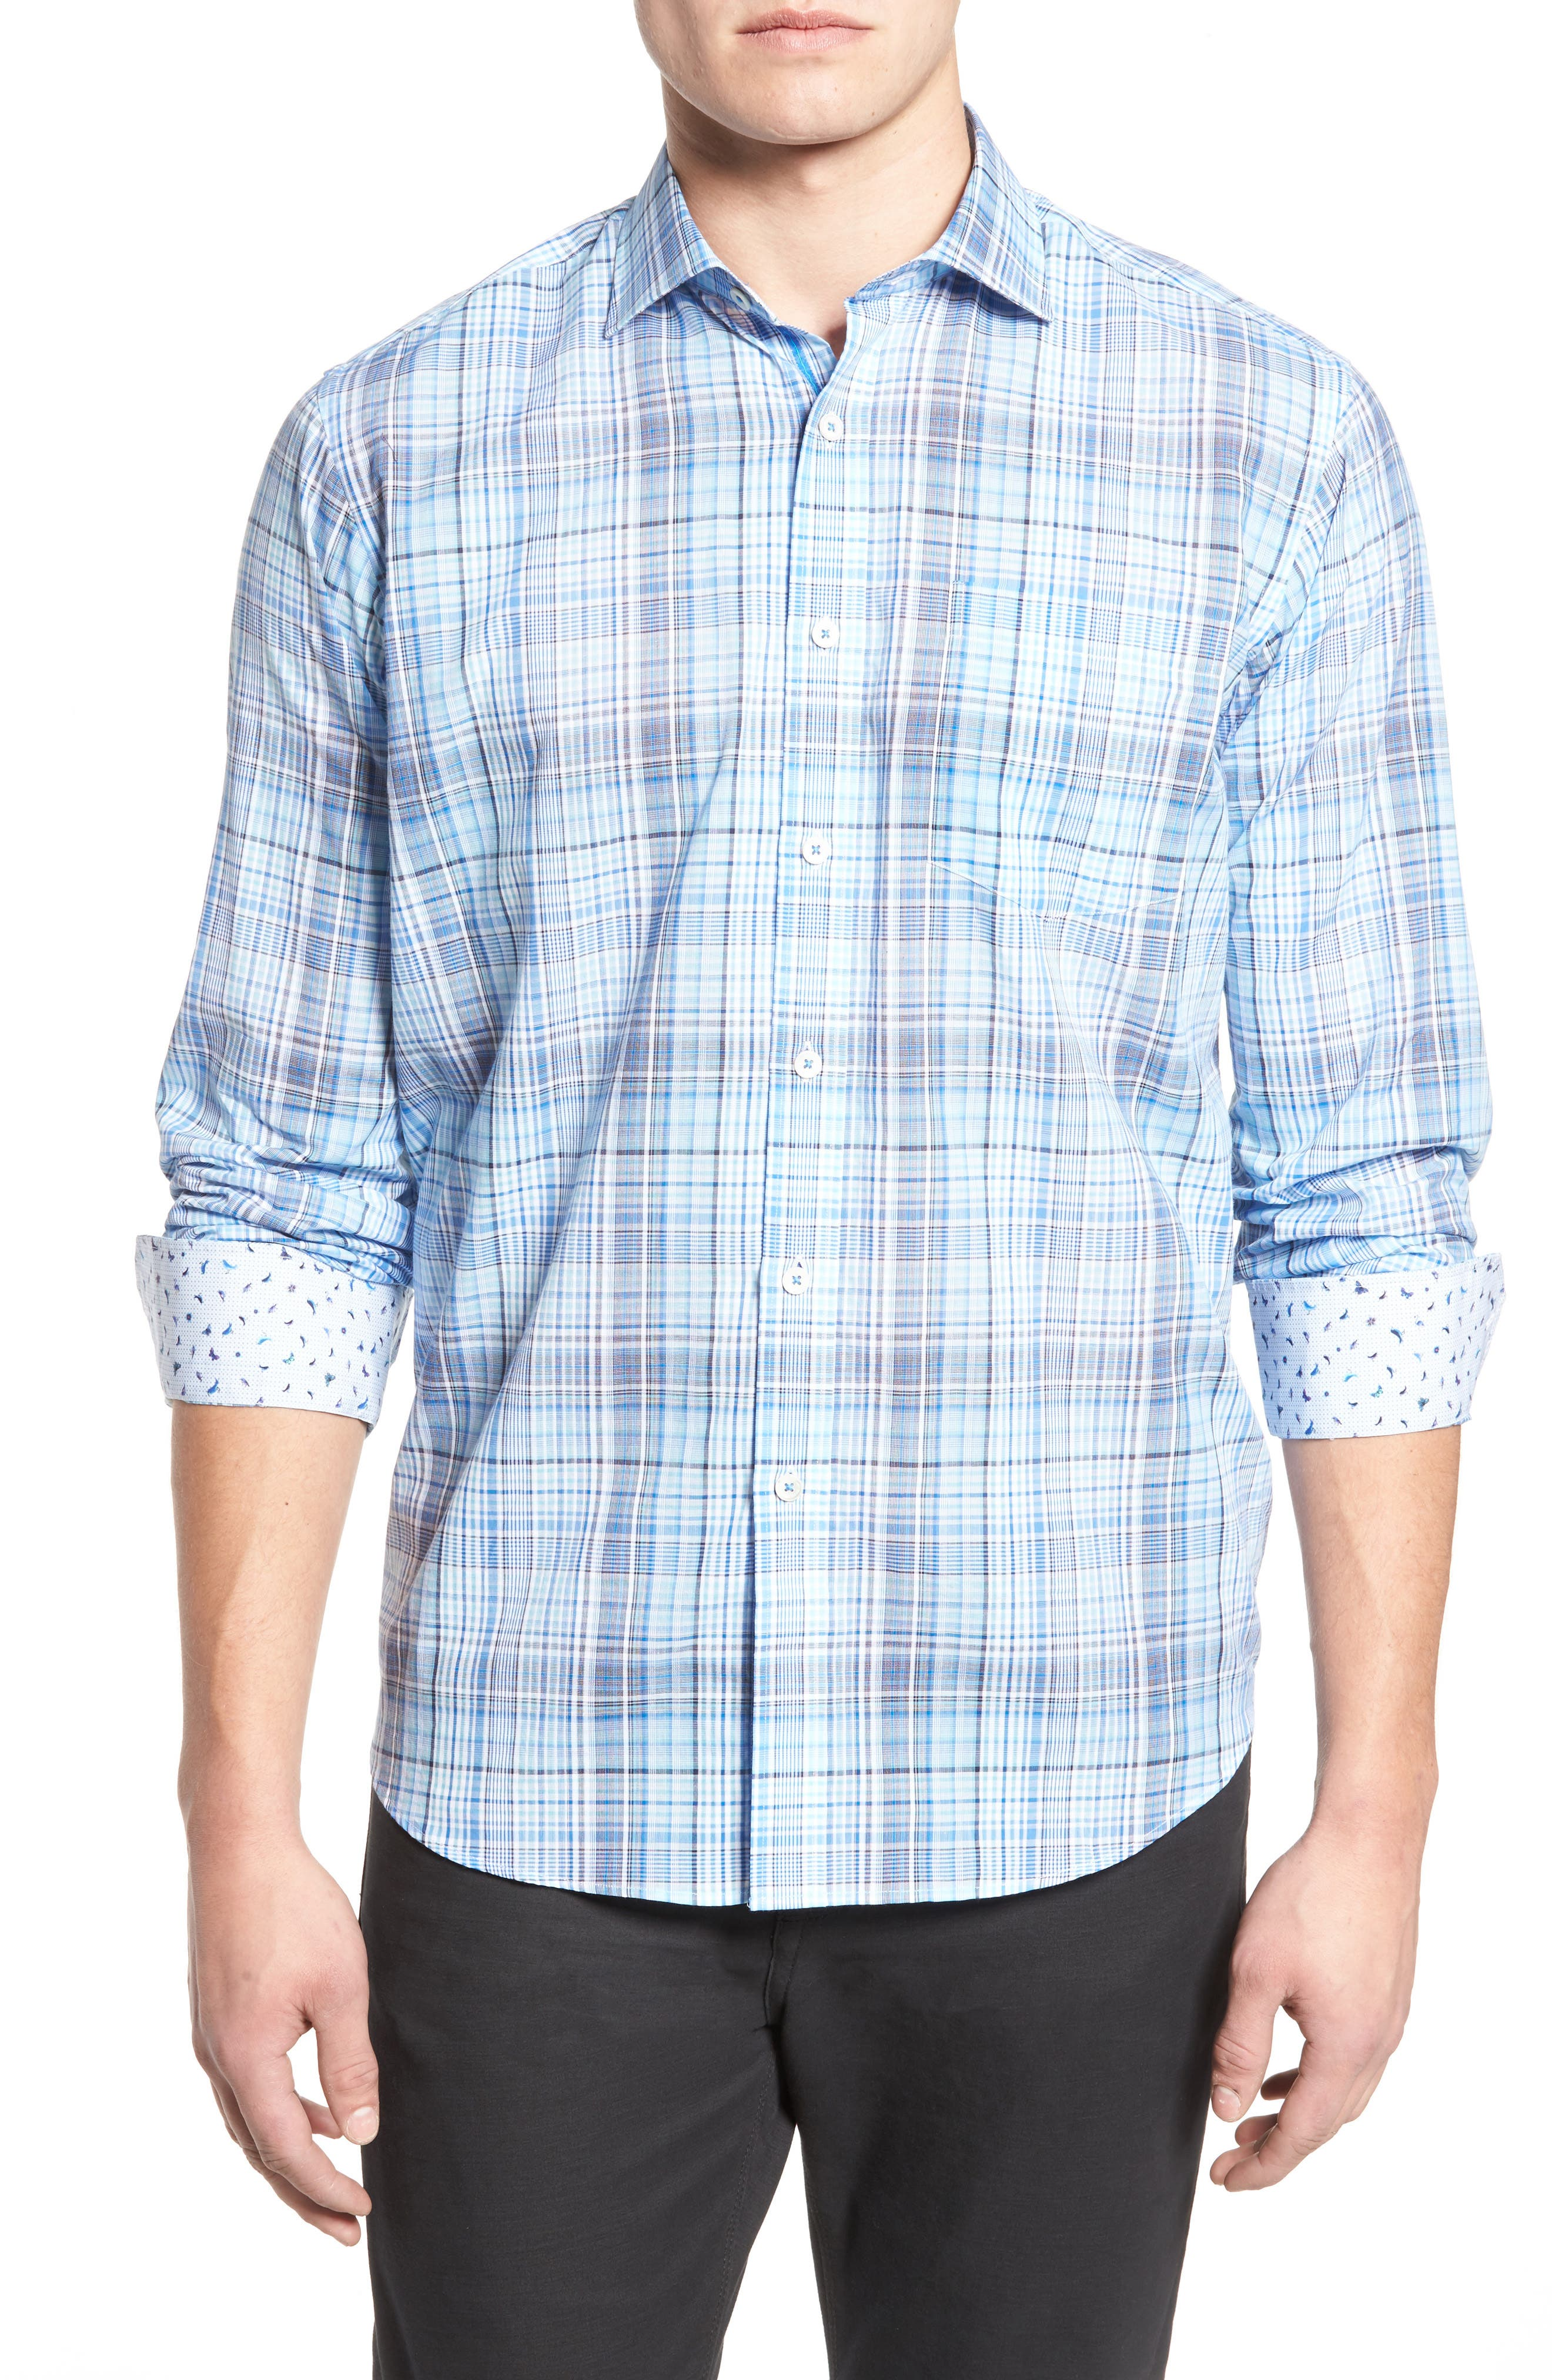 Alternate Image 1 Selected - Bugatchi Classic Fit Plaid Sport Shirt